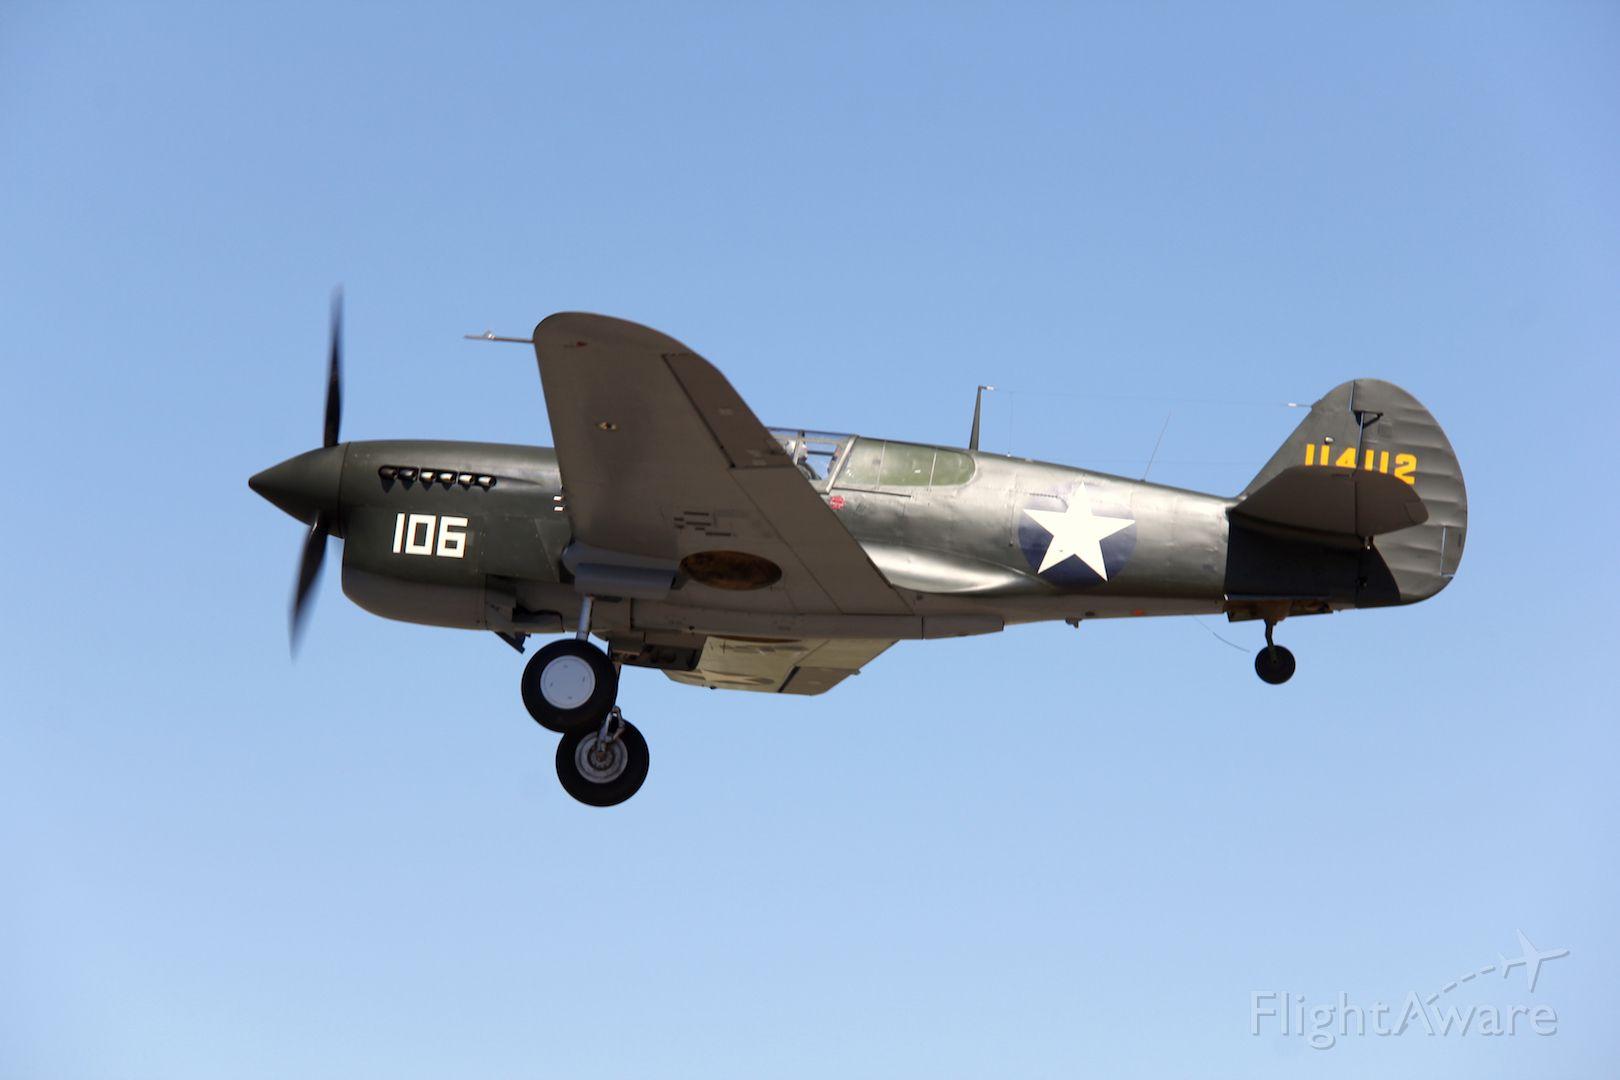 CURTISS Warhawk (VH-HWK) - Curtiss P-40F Kittyhawkbr /Manufactured in 1941, USAbr /Photo: 21.11.2015